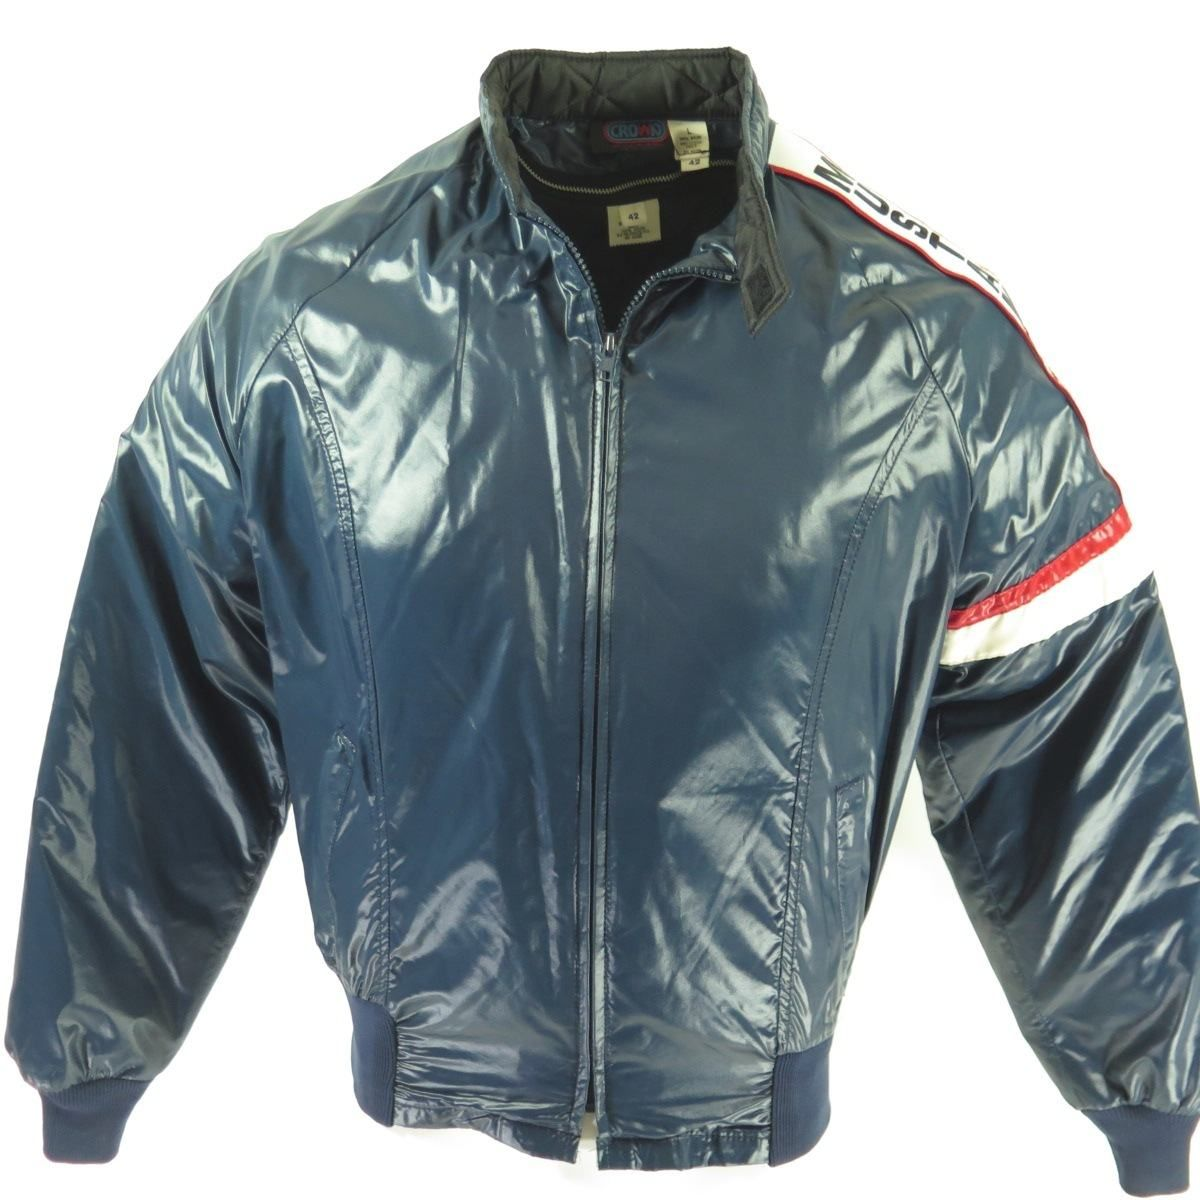 Vintage 80s Ford Mustang Gt Racing Jacket Mens L Deadstock Nos